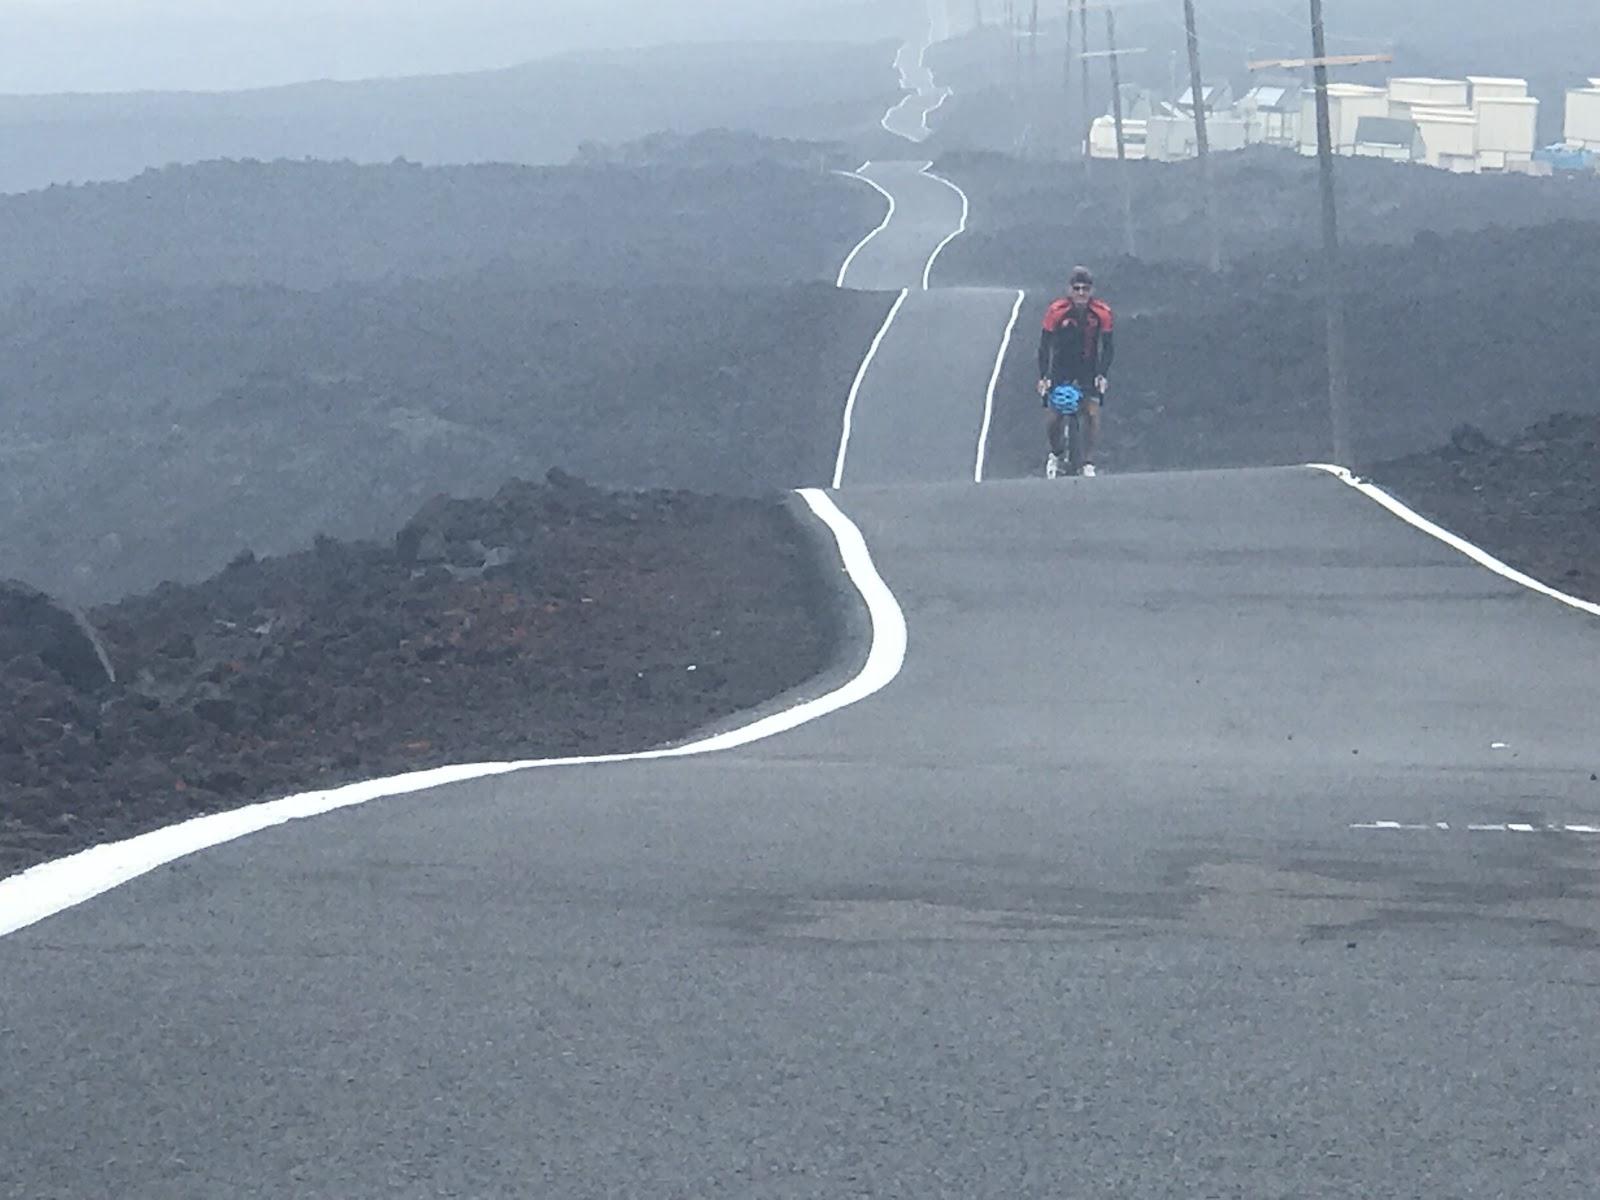 Bicycling longest road in the world - Mauna Loa Volcano - undulating roadway